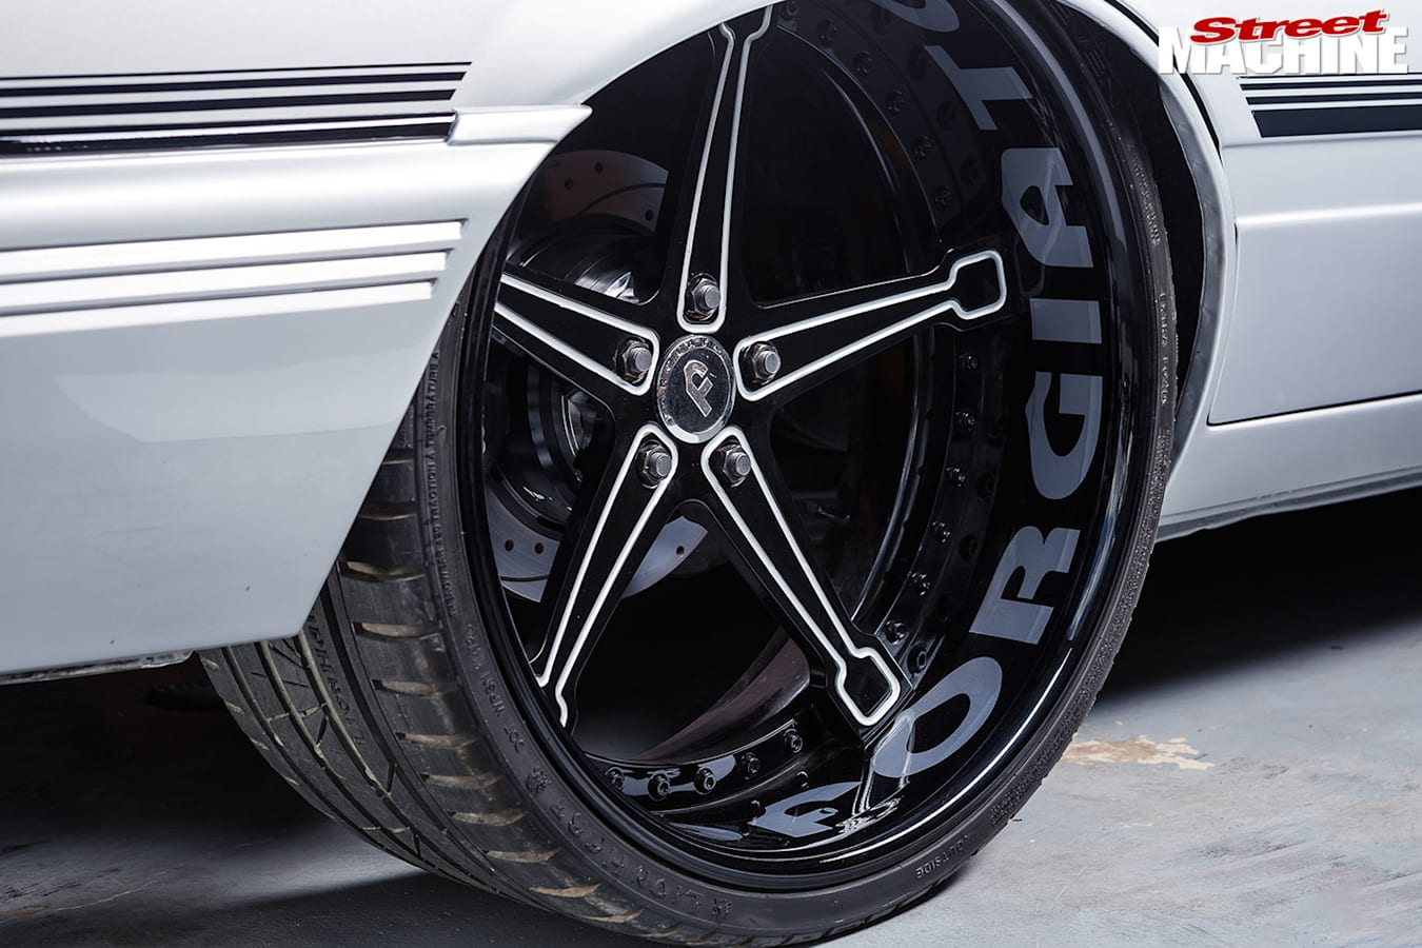 Holden VK Commodore wheel